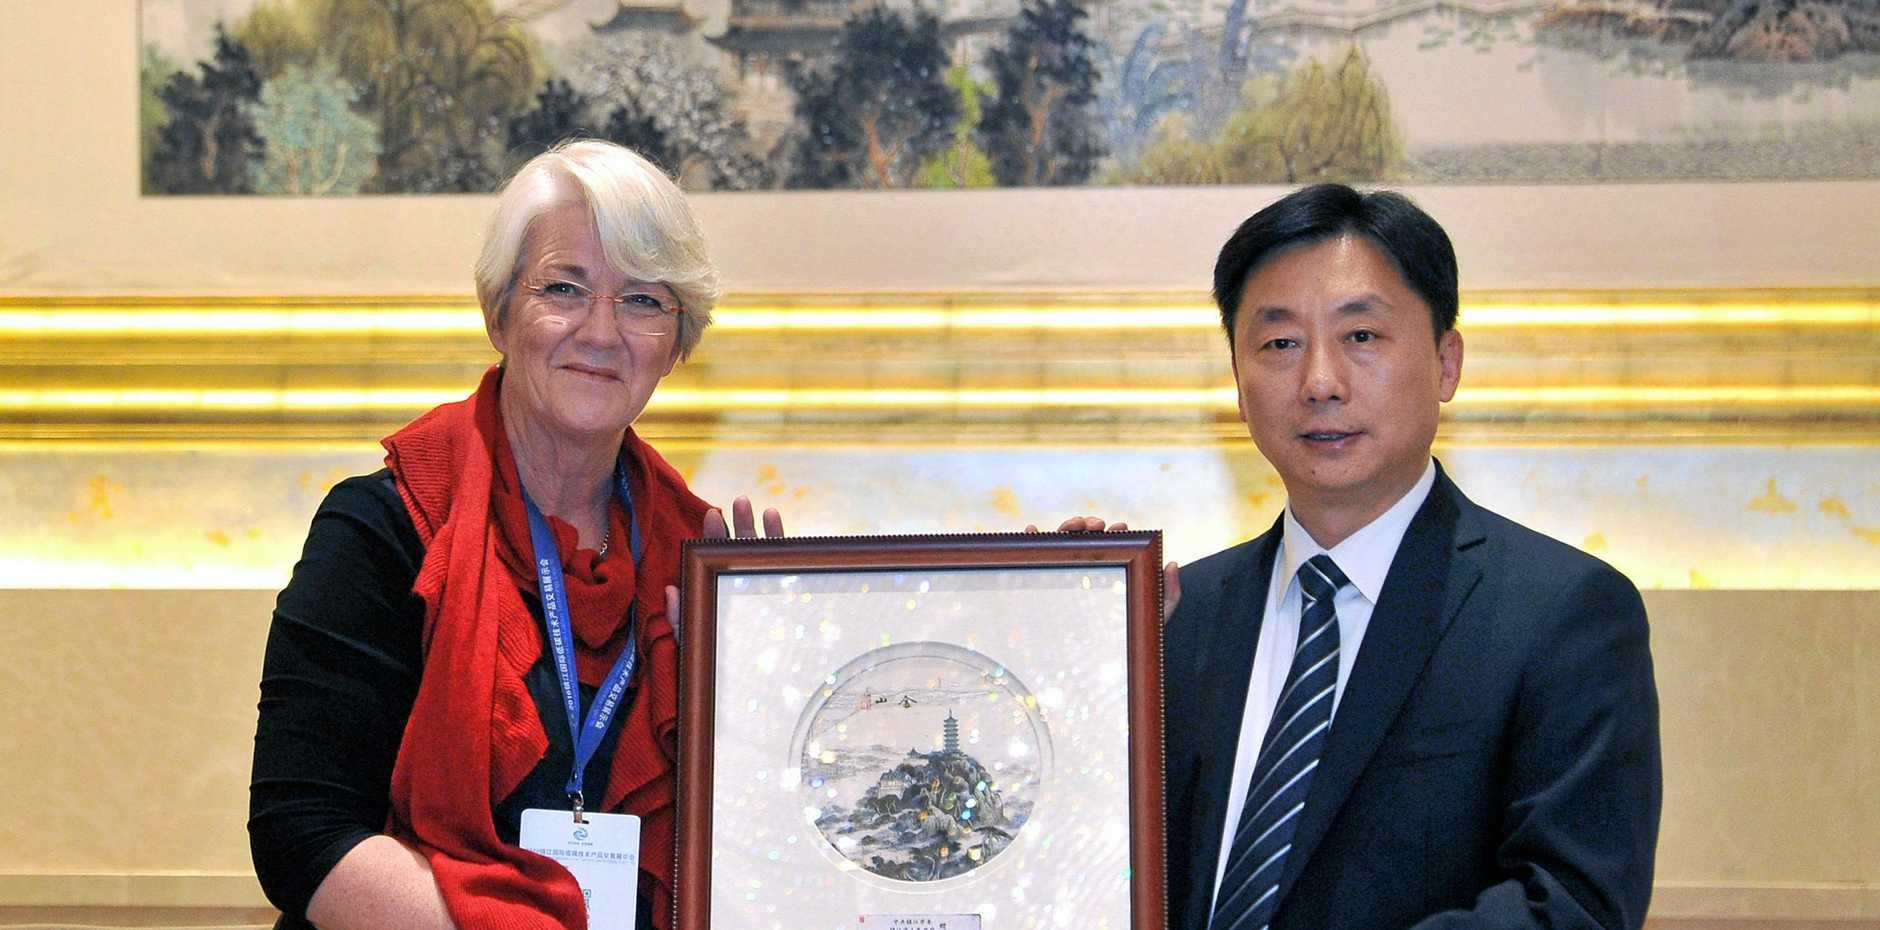 TRADE: Rockhampton Region Mayor Margaret Strelow with Xia Jinwen, Zhenjiang's Party Secretary.